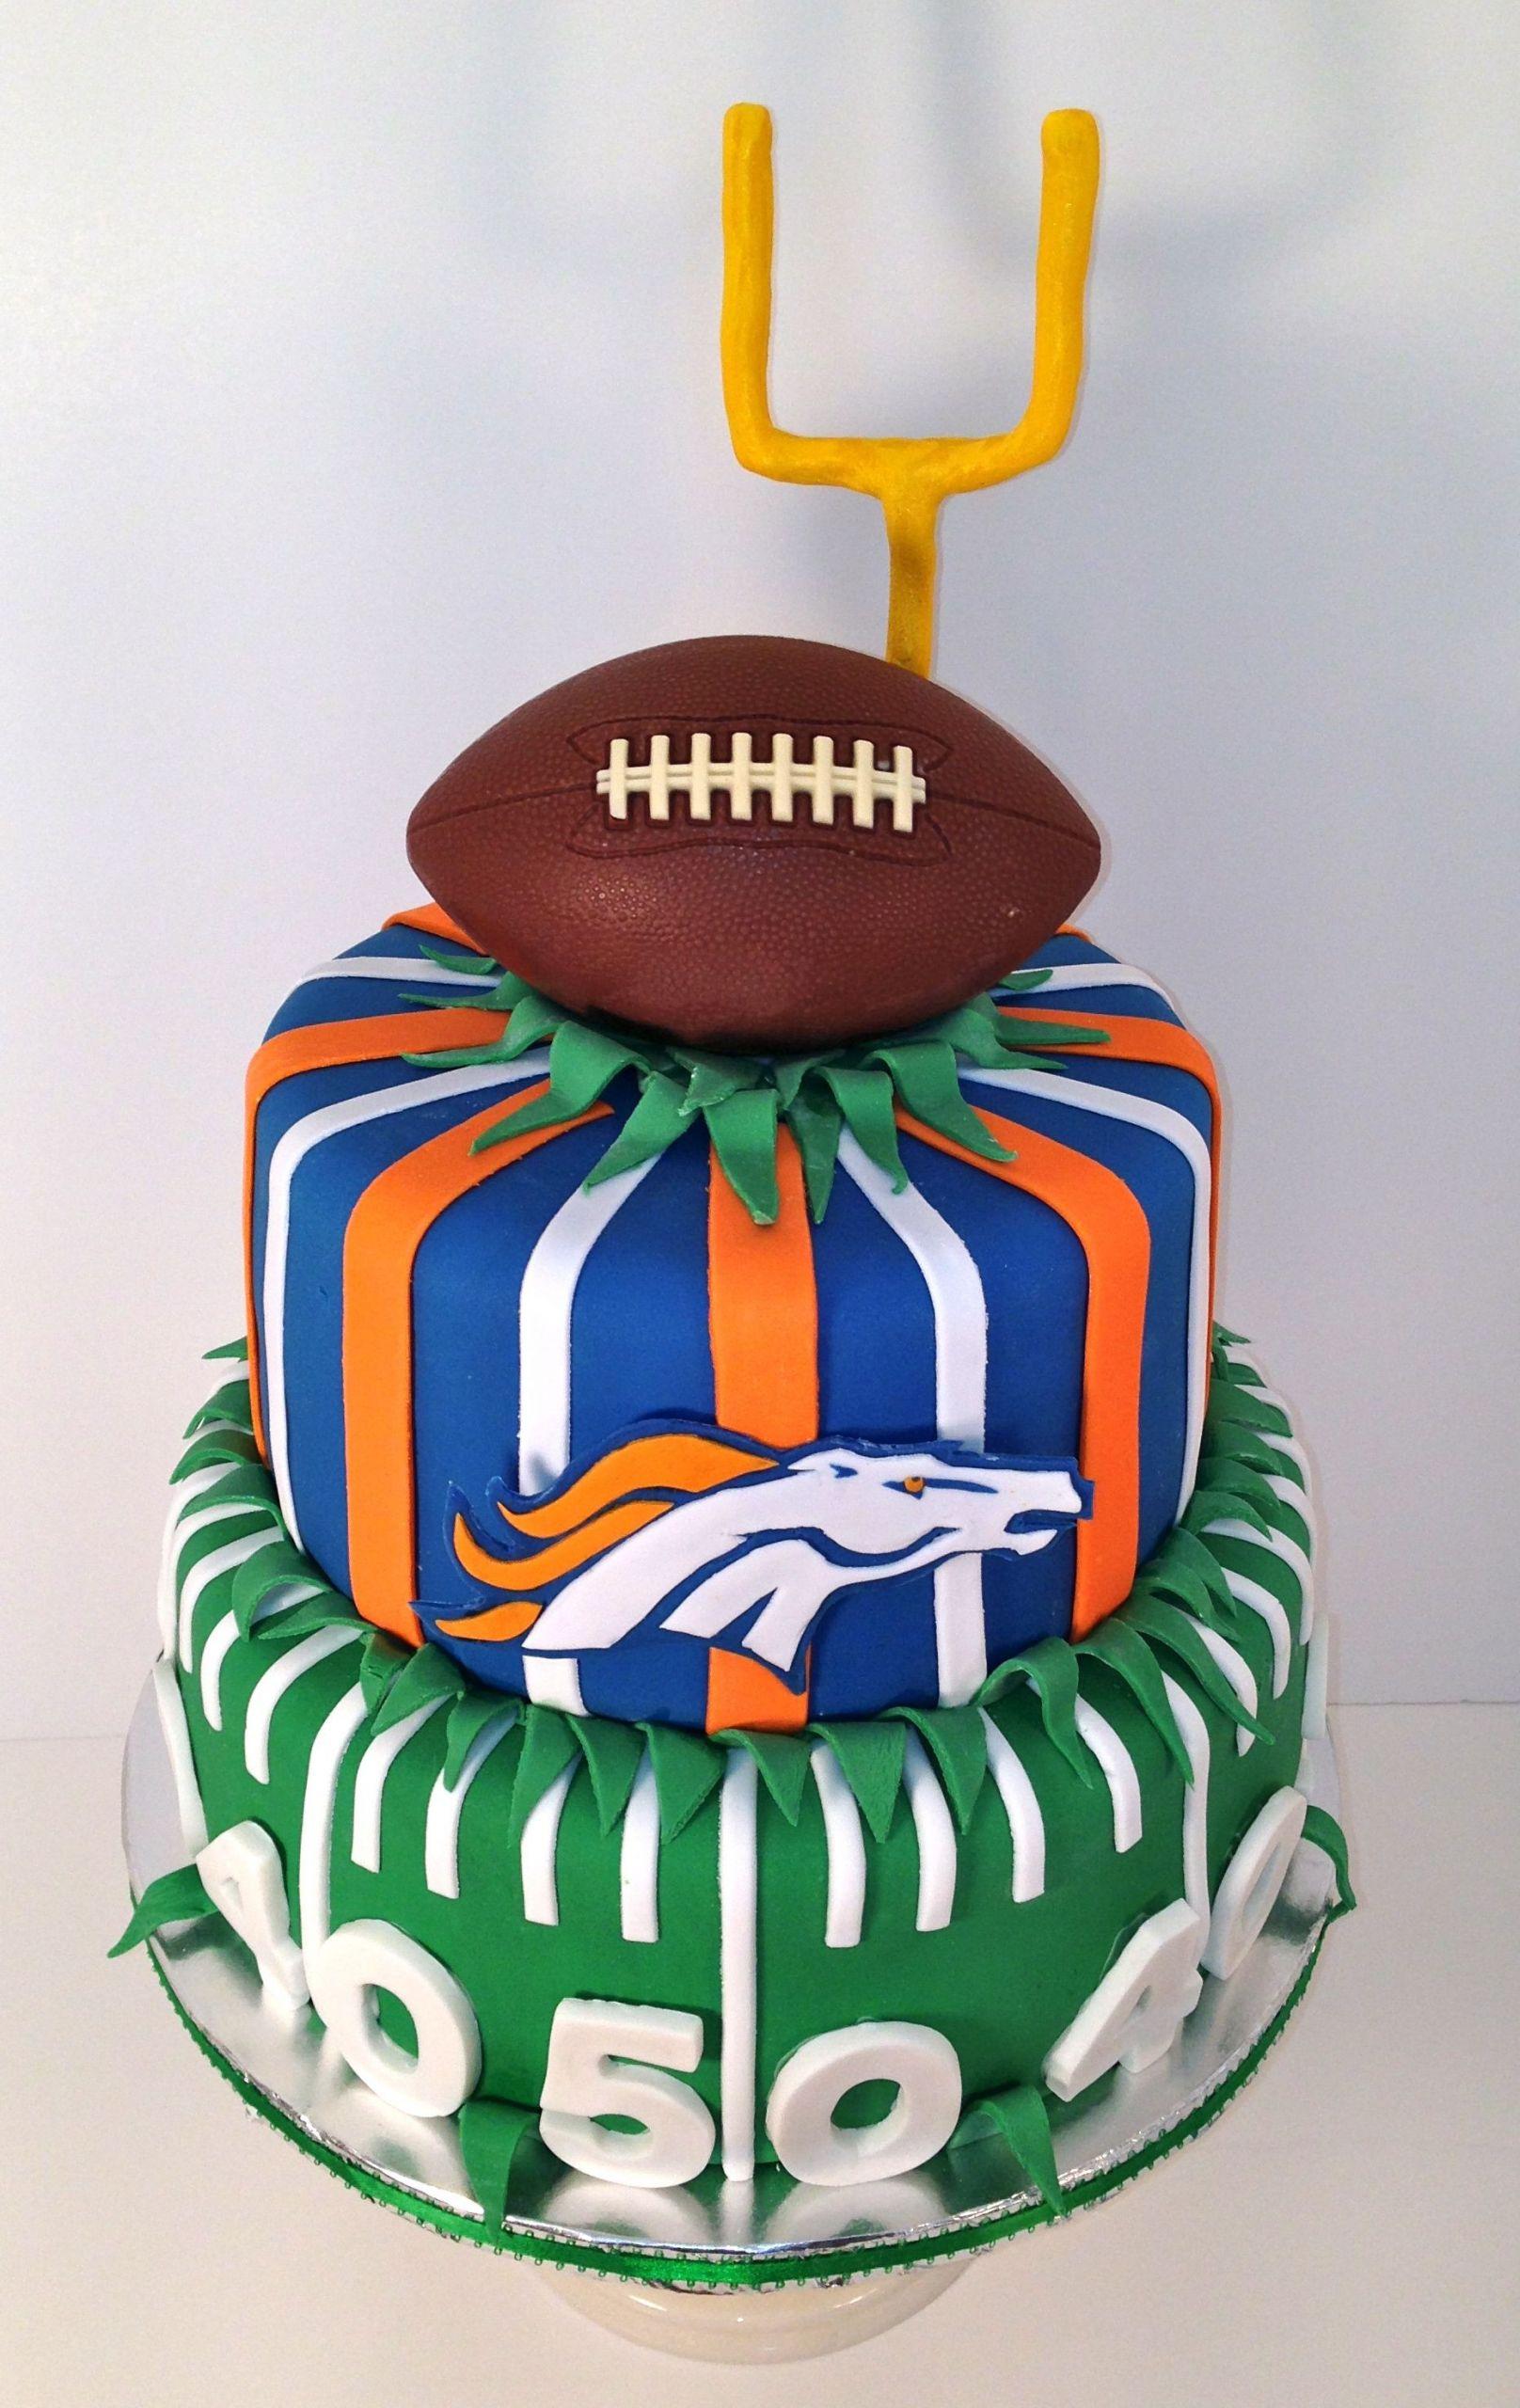 Birthday Cakes Denver  Cakes by Kirsten Denver bronco s cake football cake